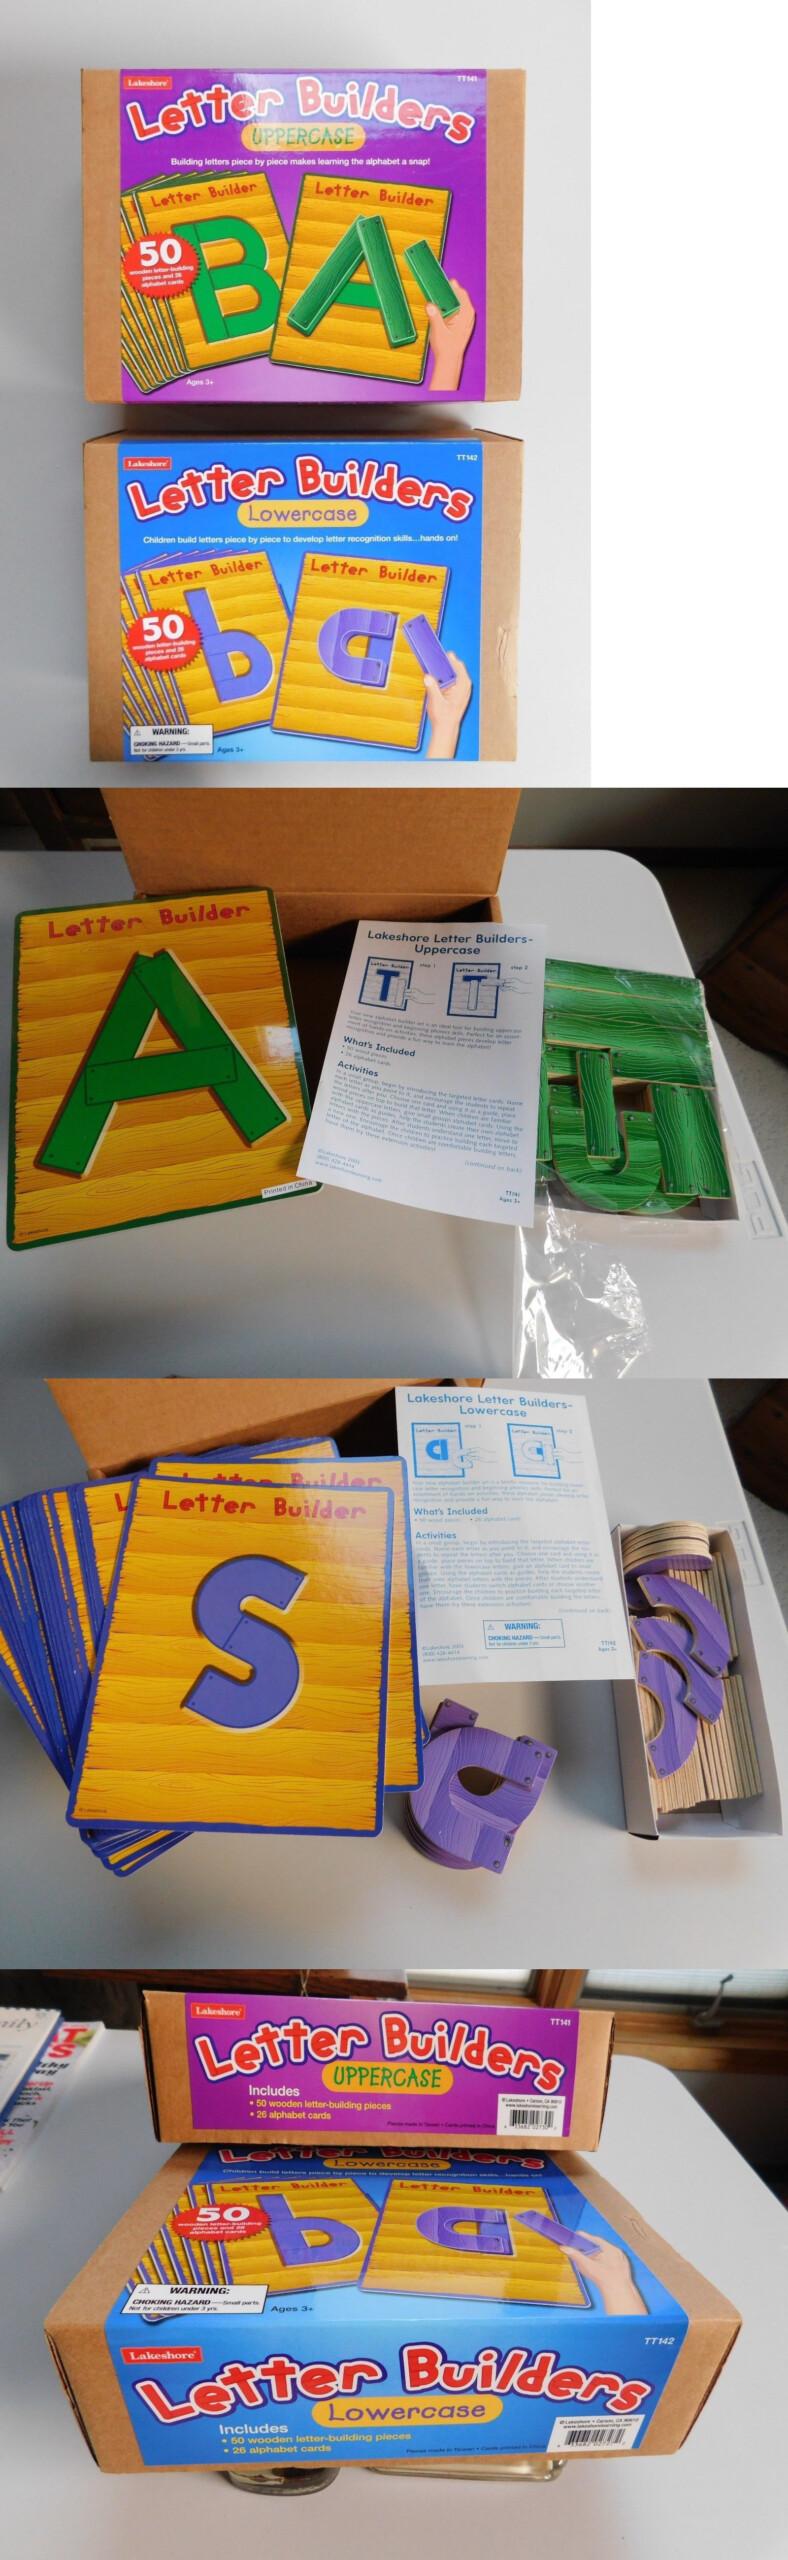 Alphabet And Language 145930: Lakeshore Learning Alphabet within Lakeshore Tracing Letters